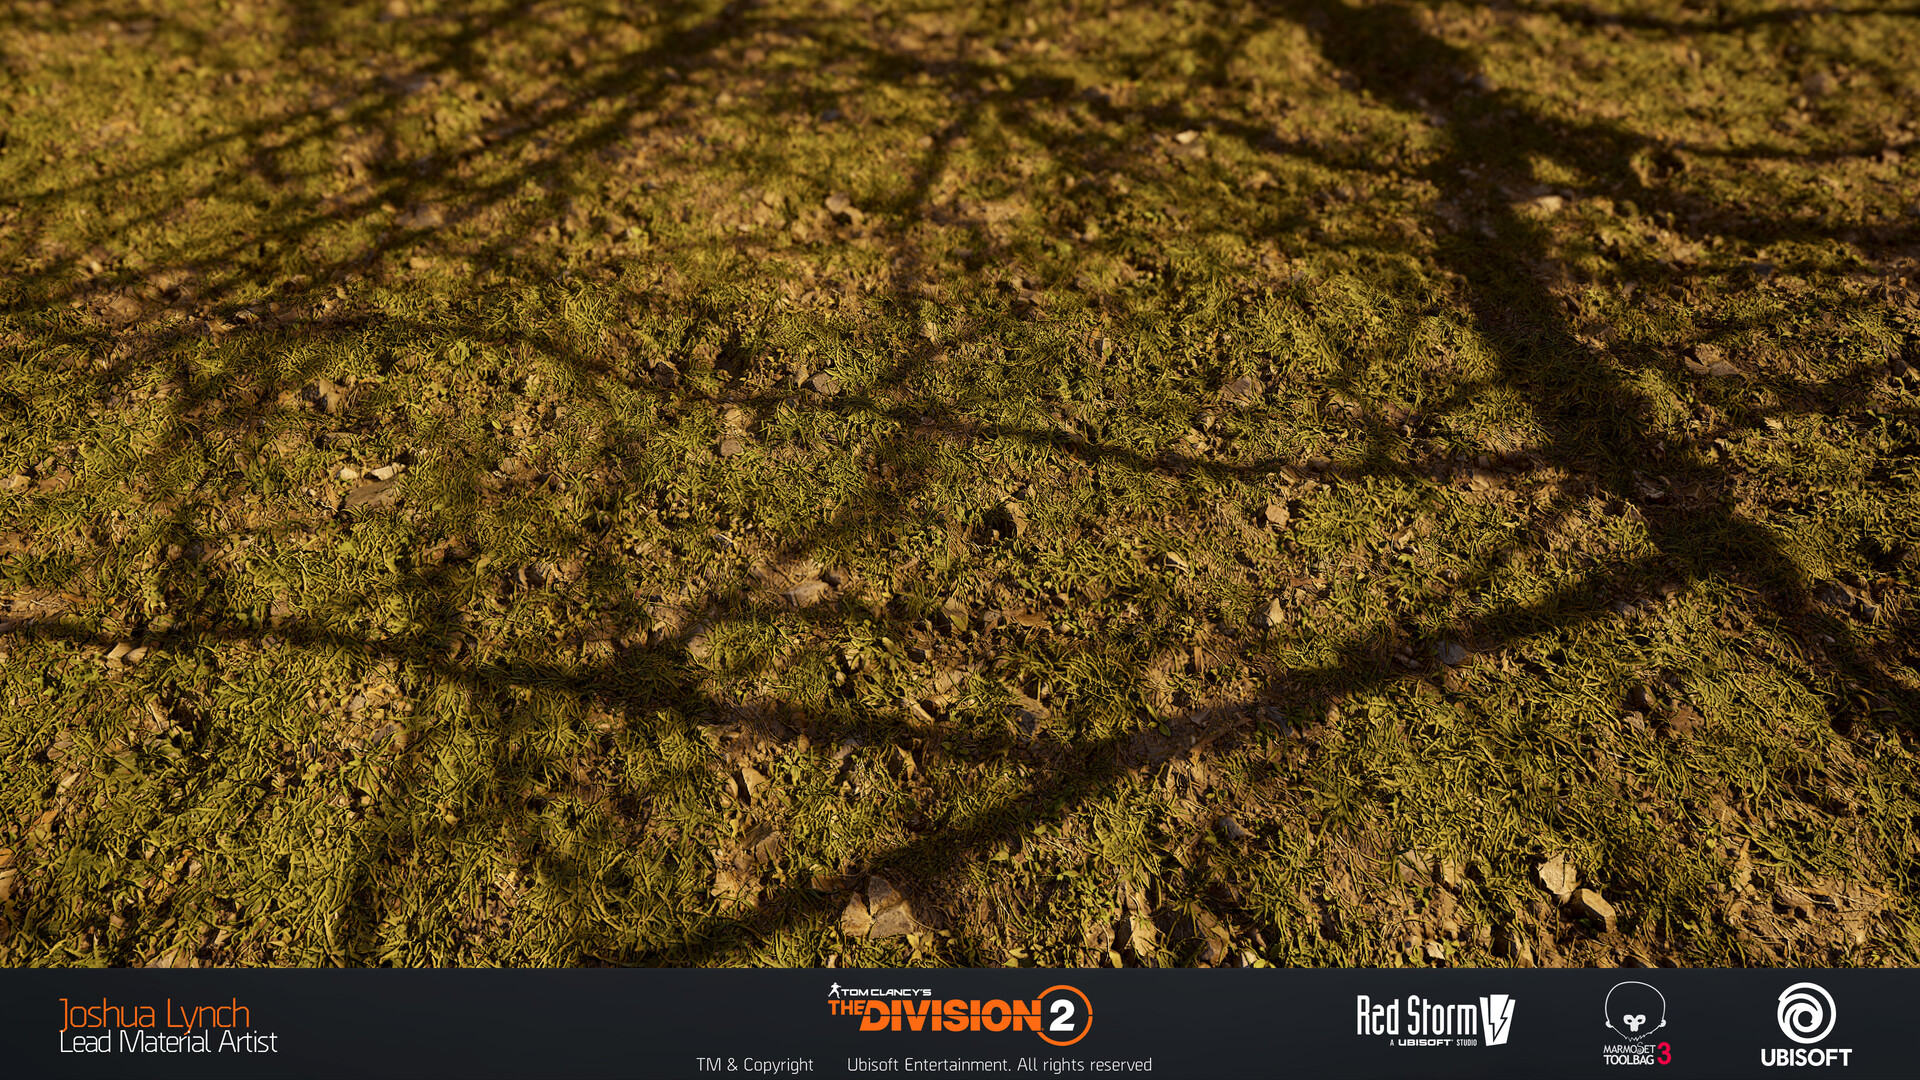 Joshua lynch division 2 josh lynch soil grass ground